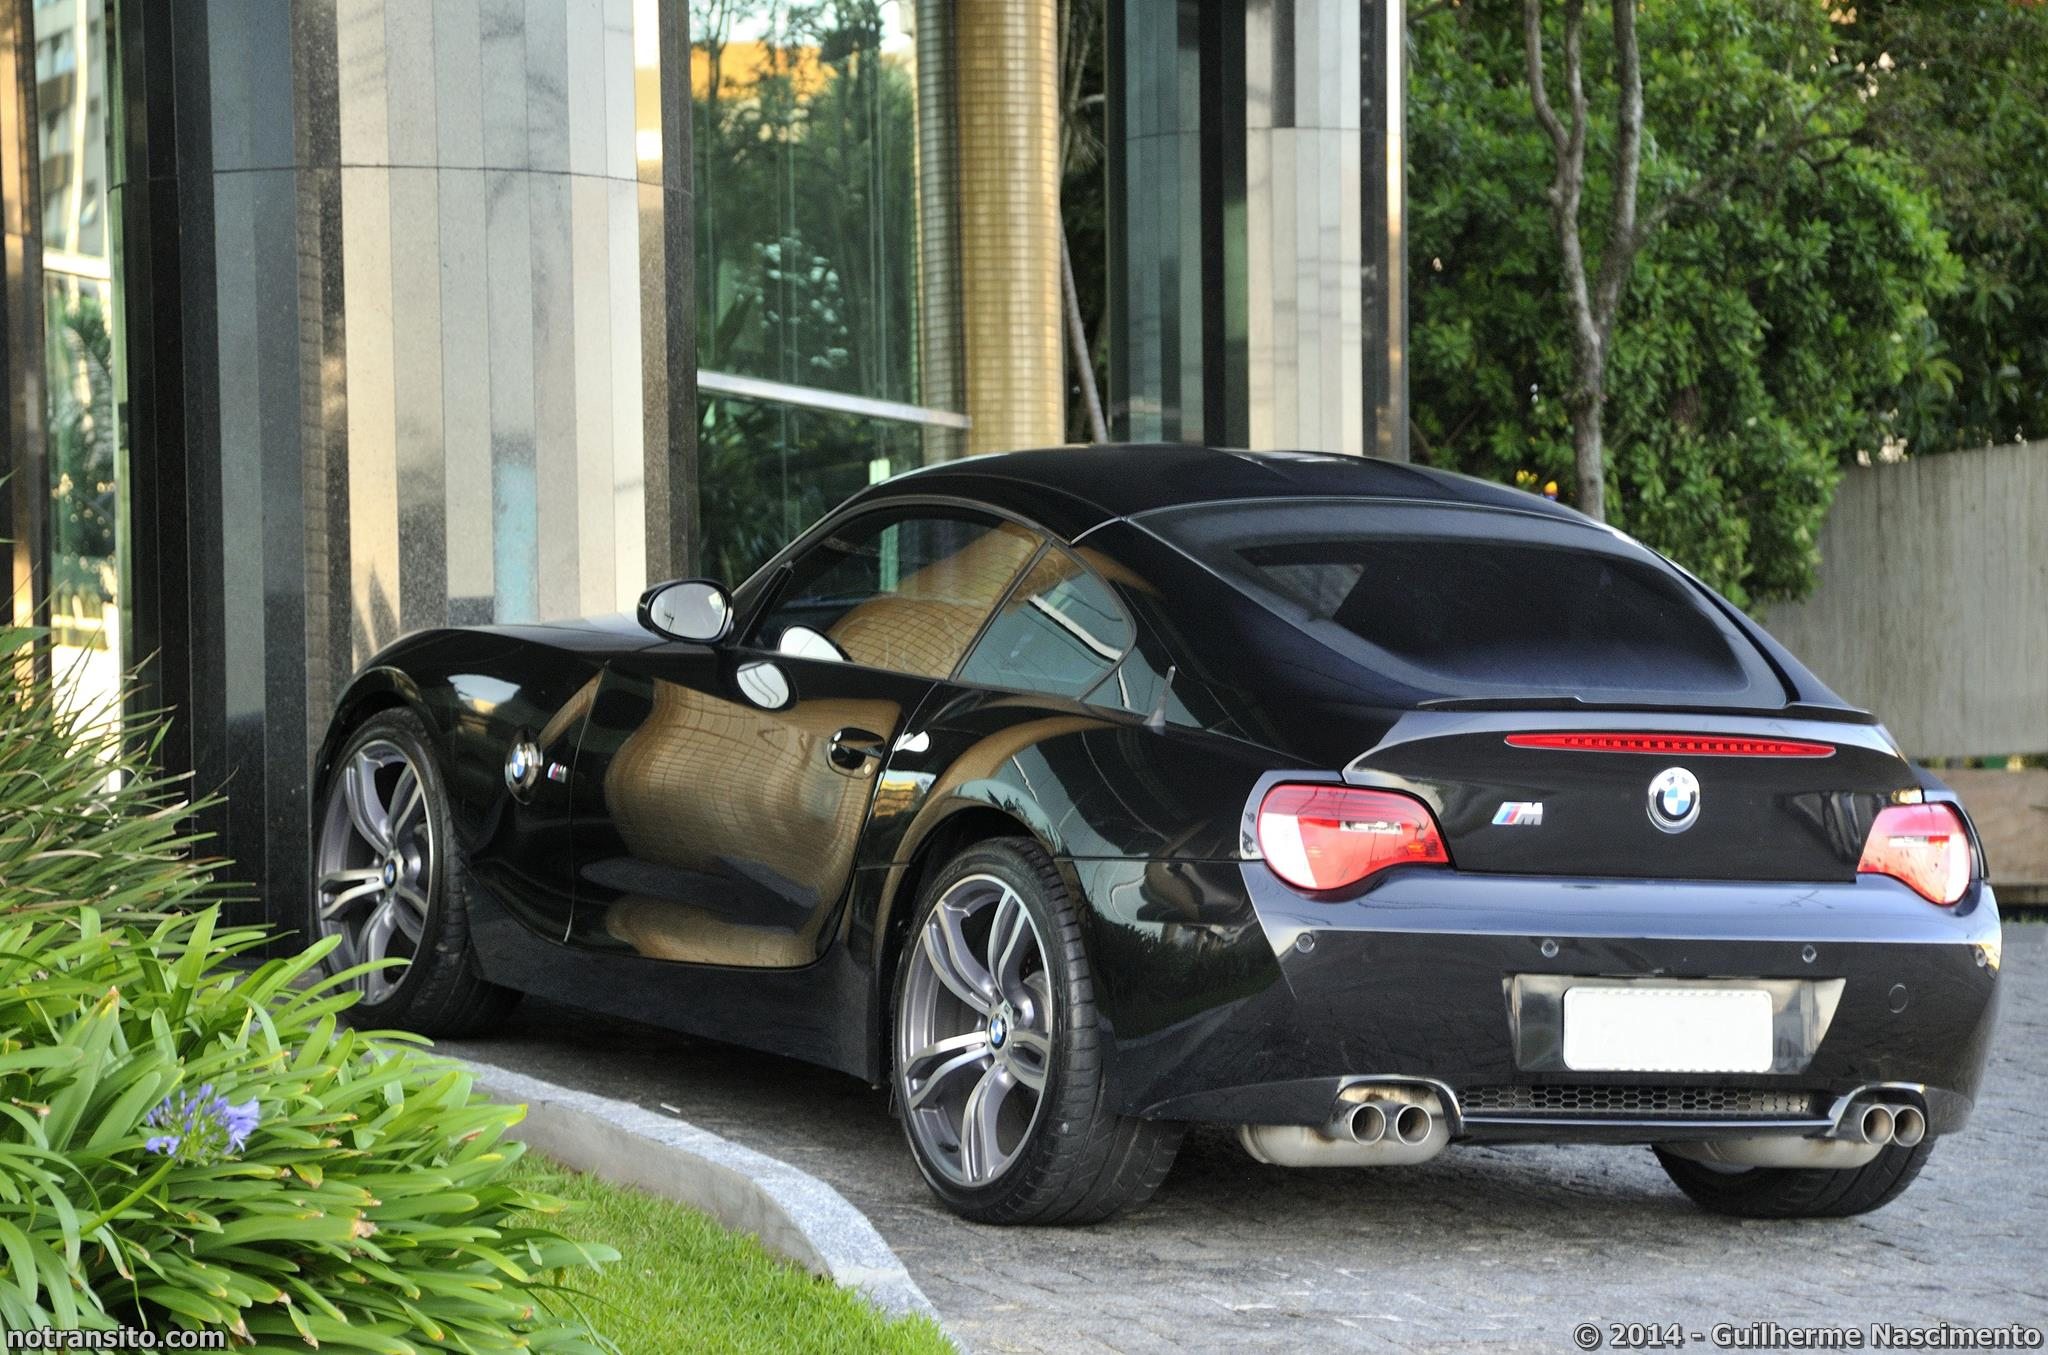 Bmw Z4 M Coupe No Transito